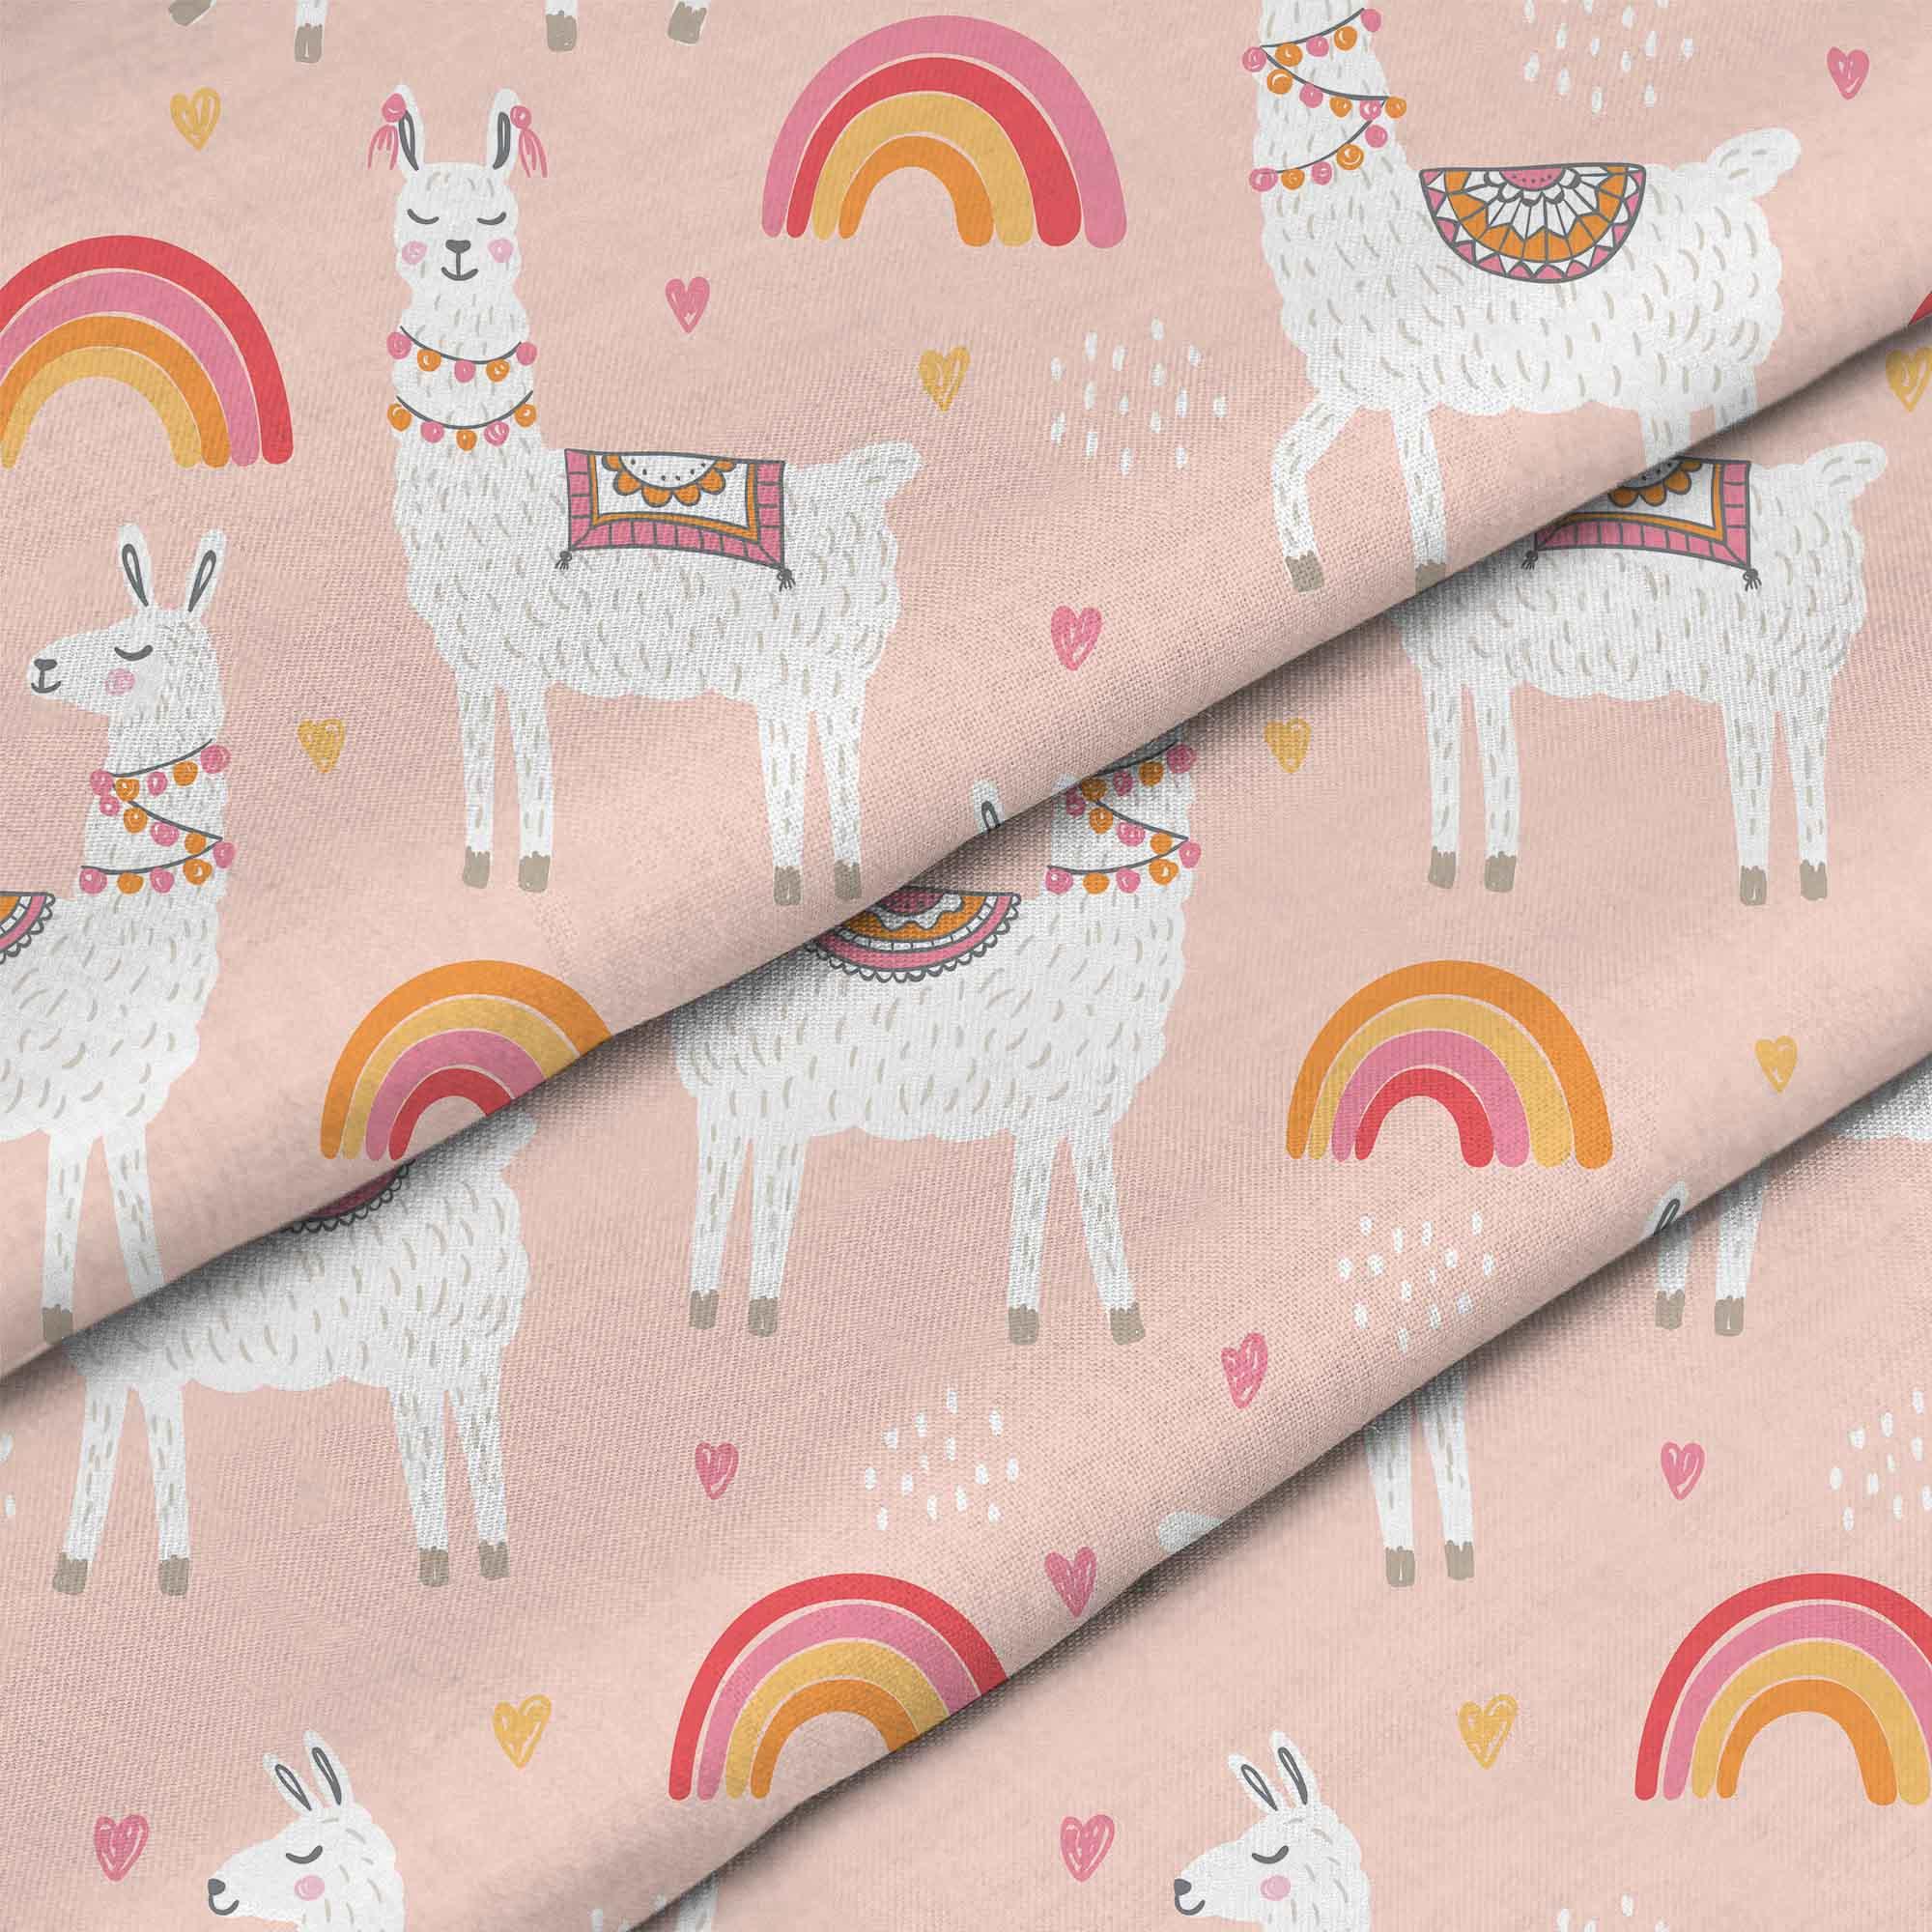 Lamas With Rainbows